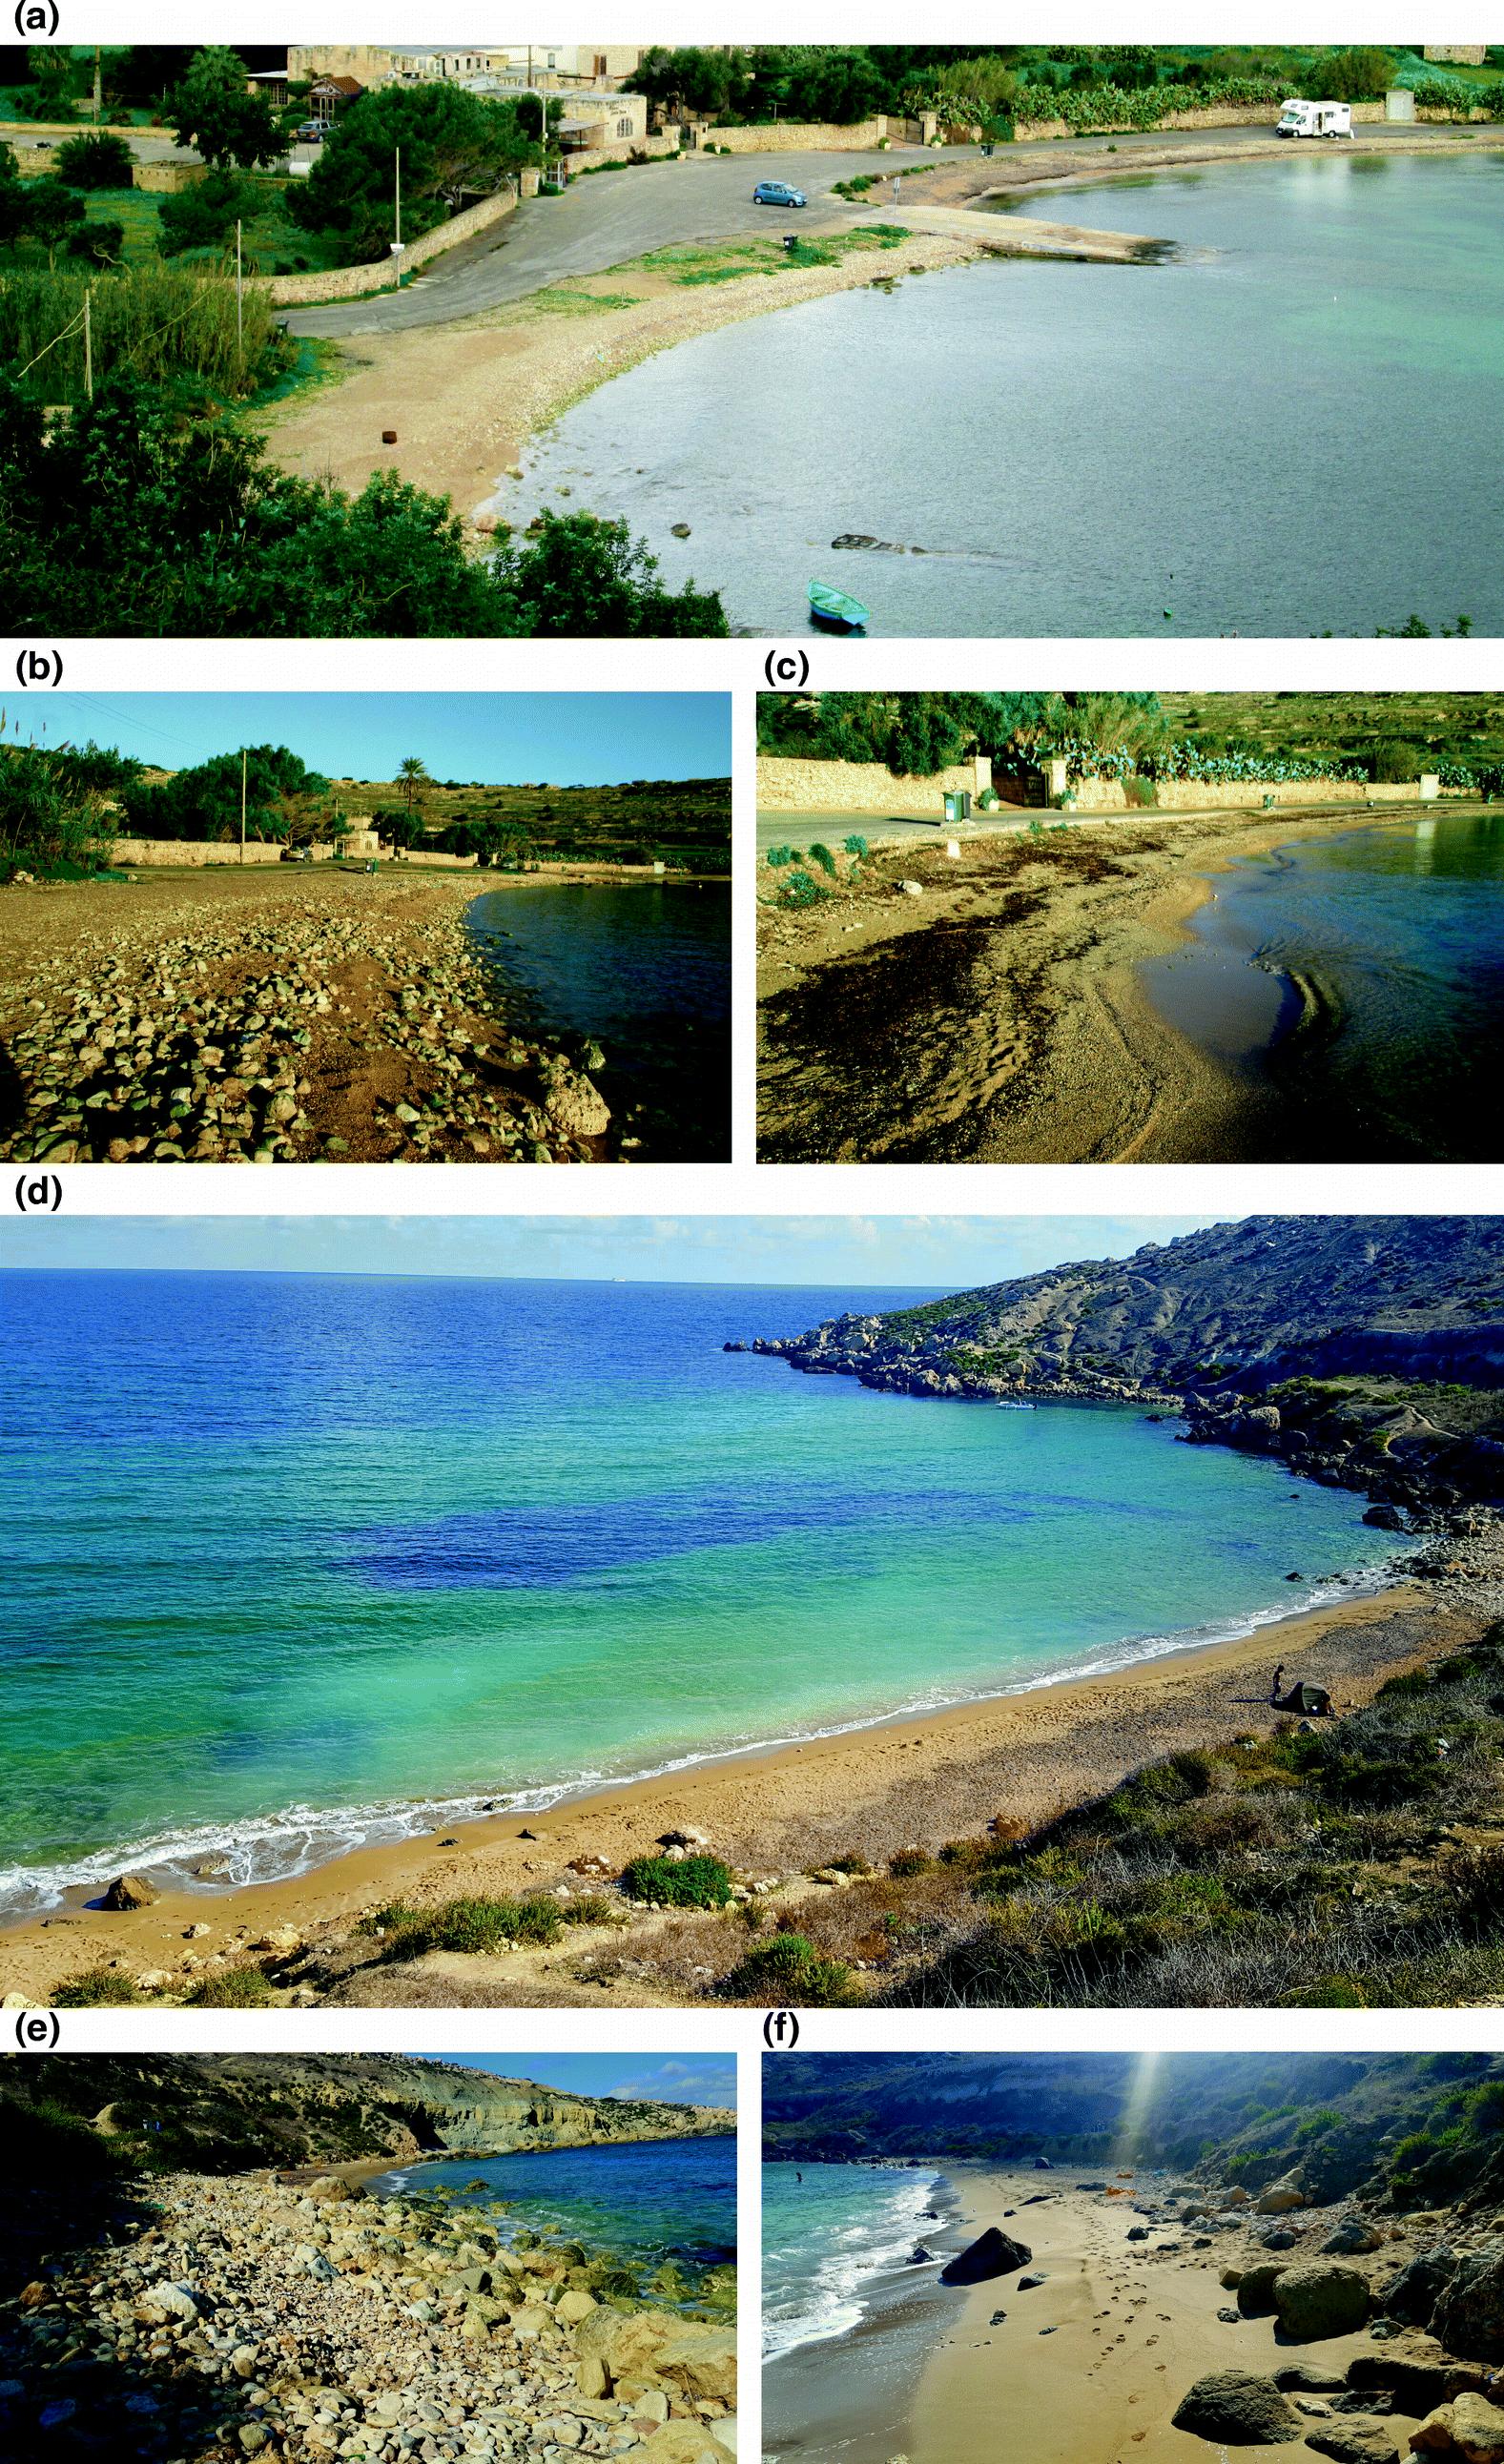 Selmun: A Coastal Limestone Landscape Enriched by Scenic